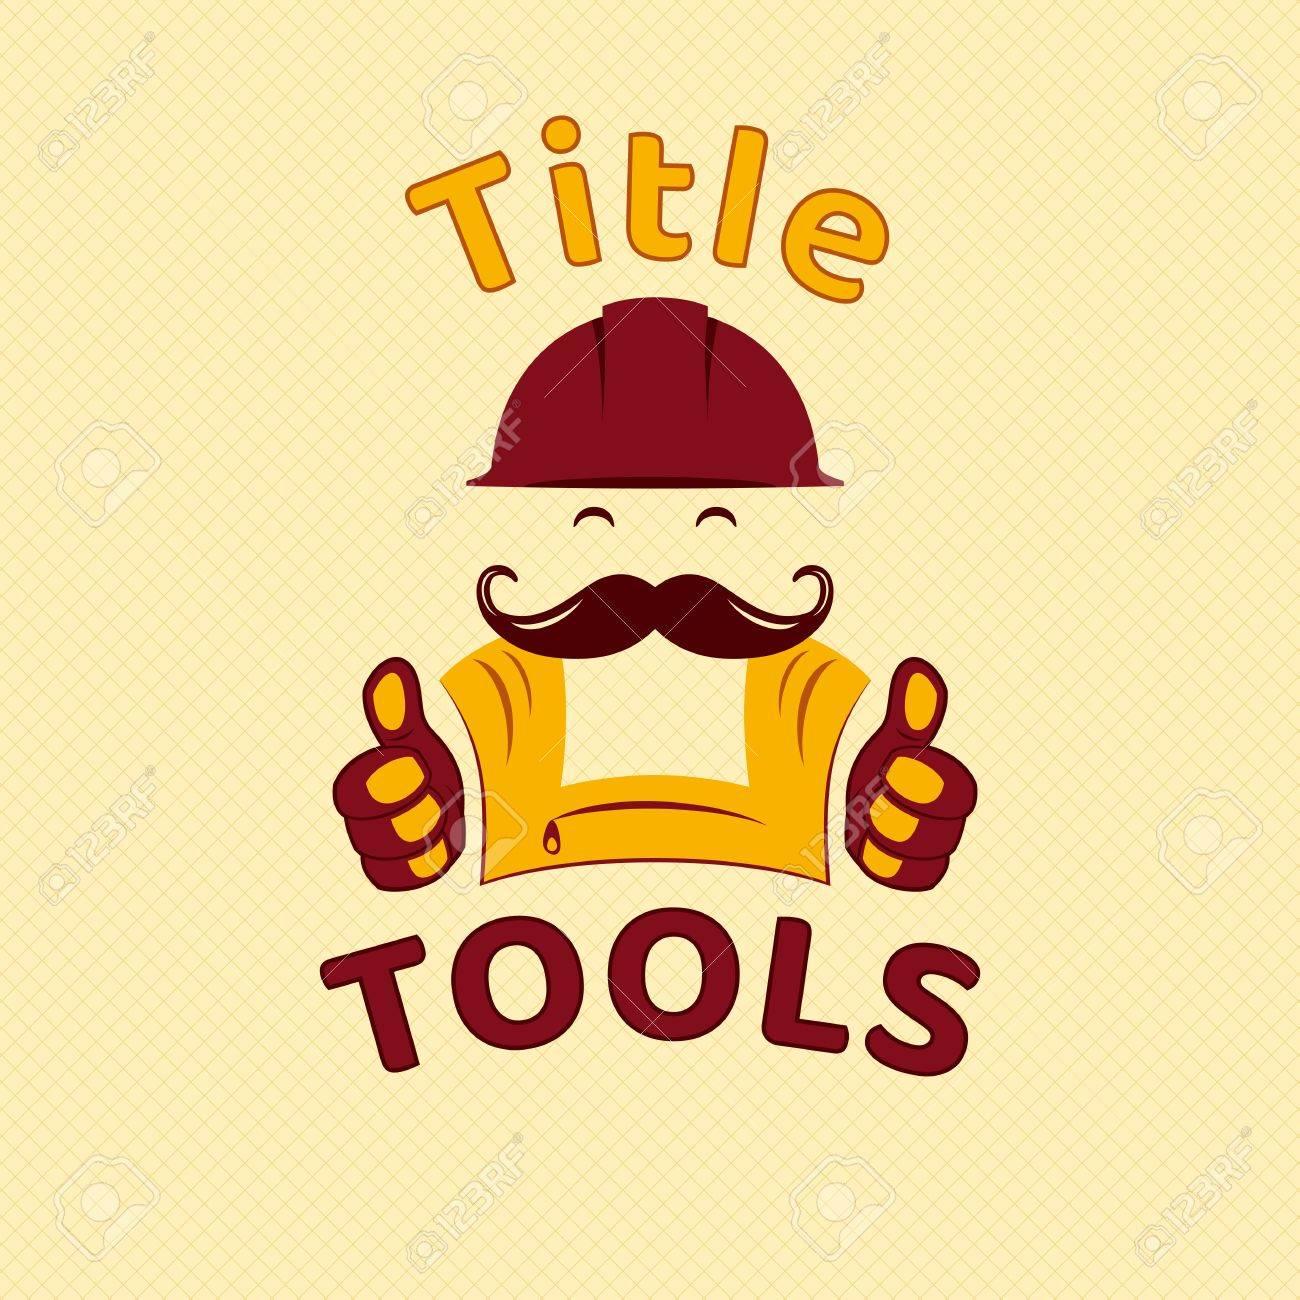 tools emblem logo for handyman small business construction